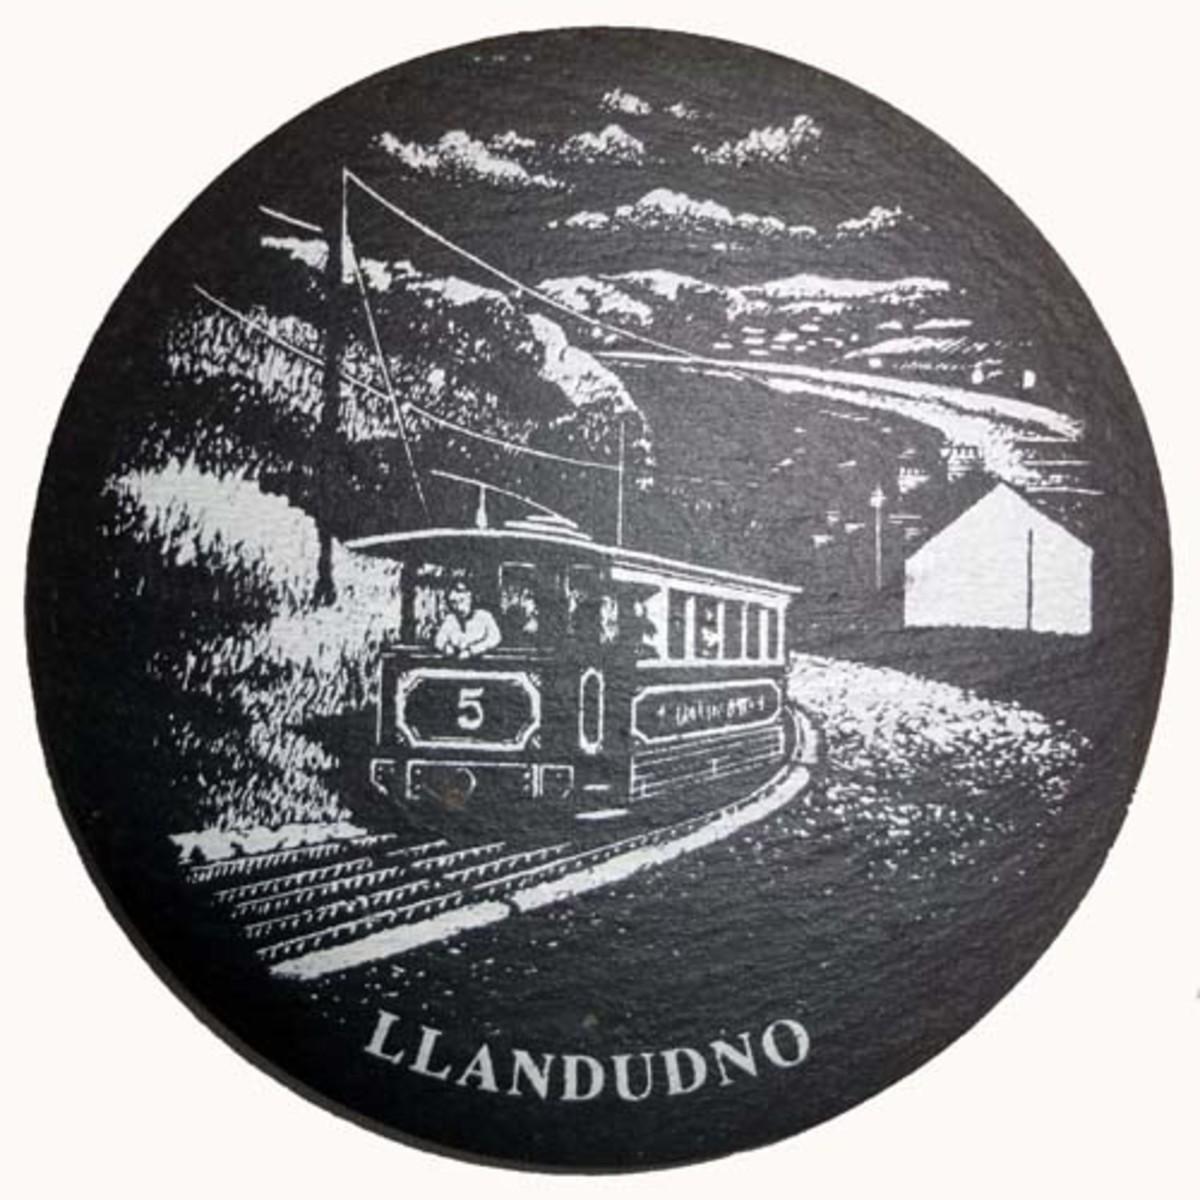 Slate coaster of Llandudno, North Wales